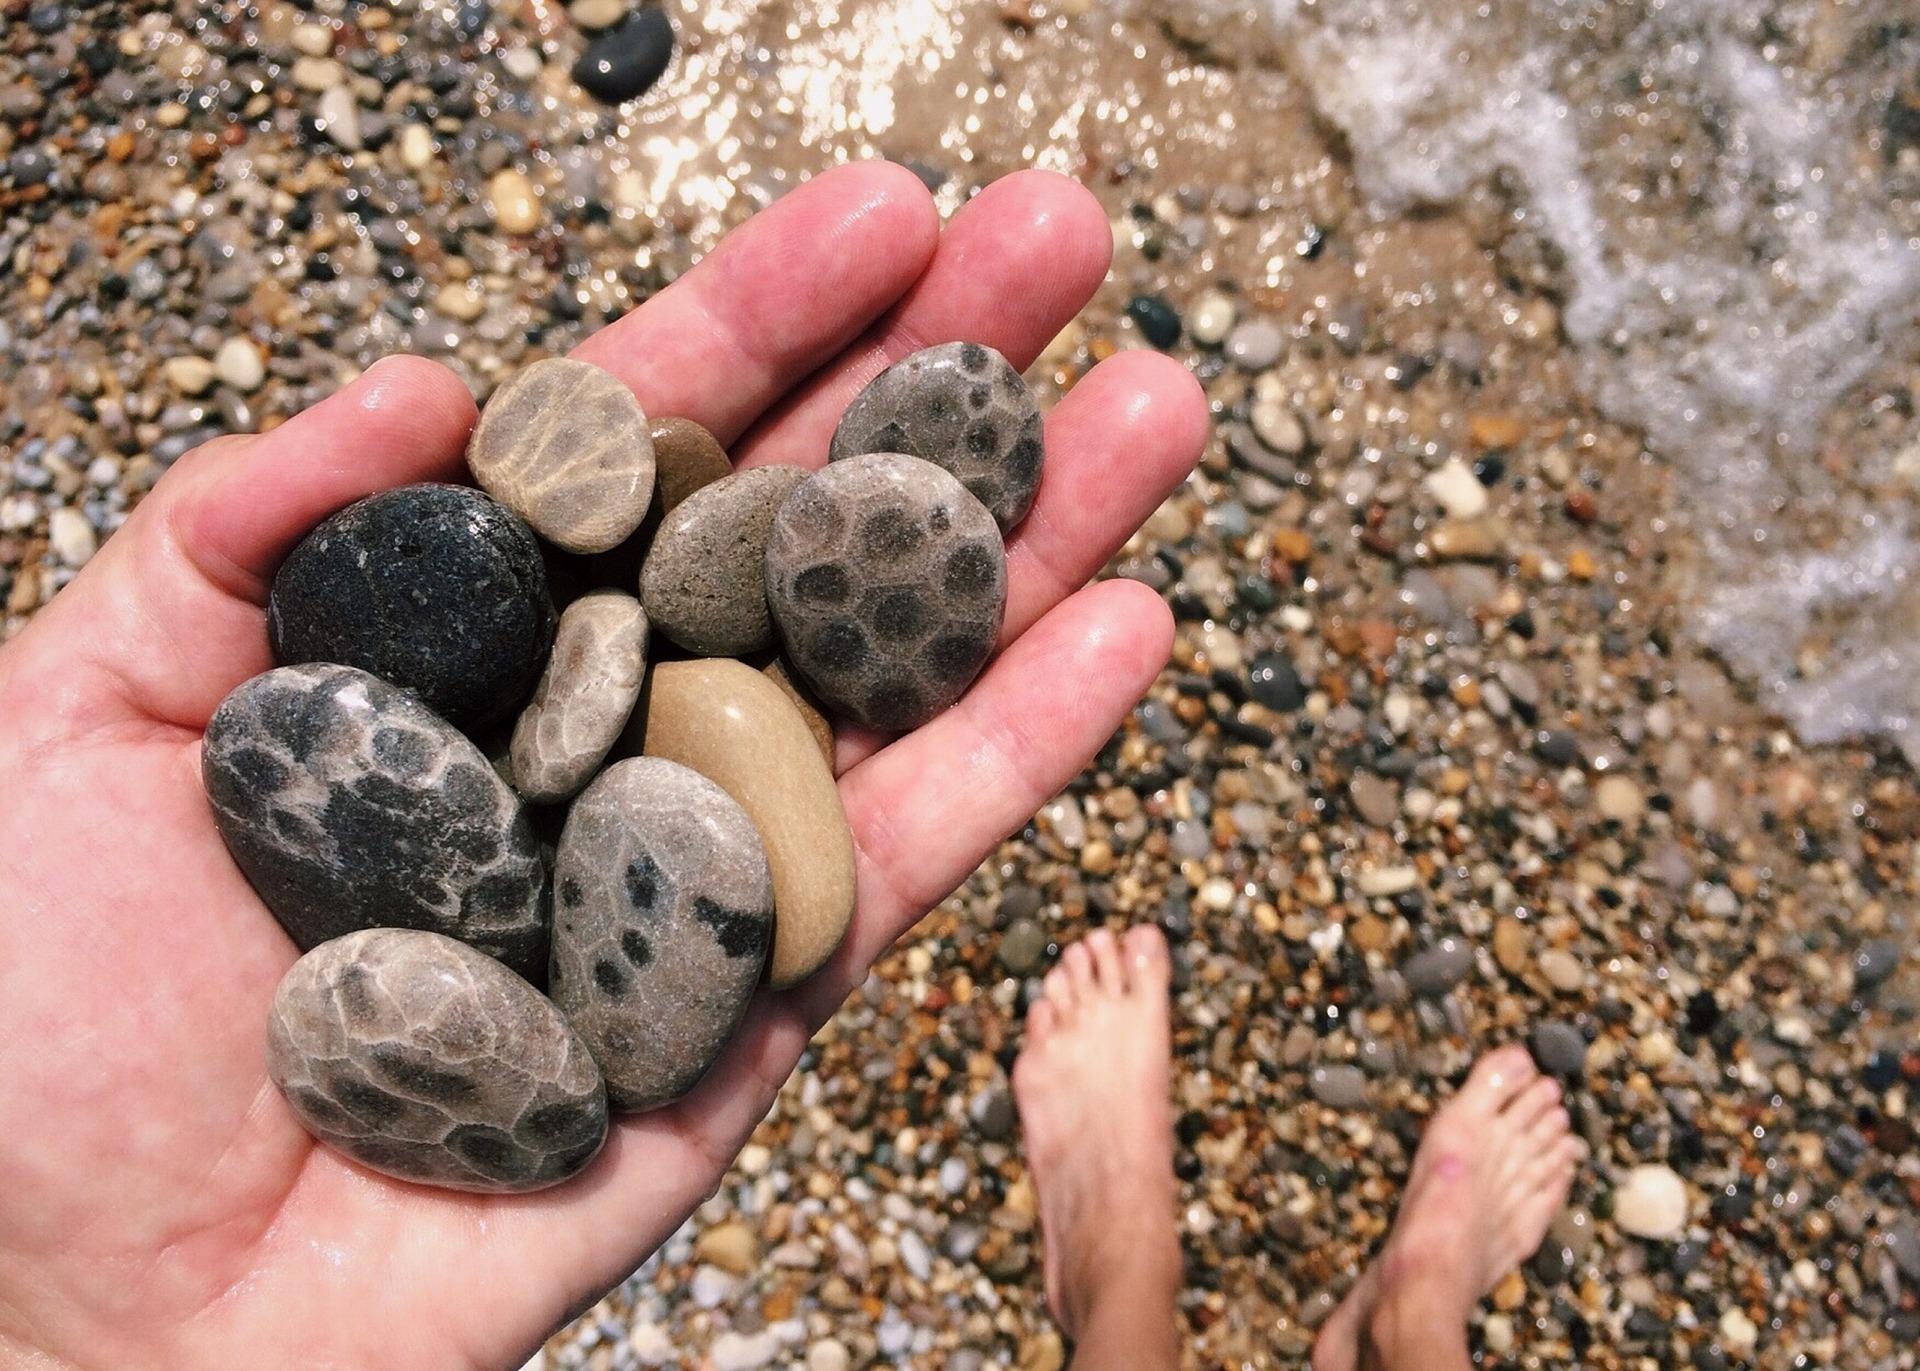 Petoskey stones, stones, rocks